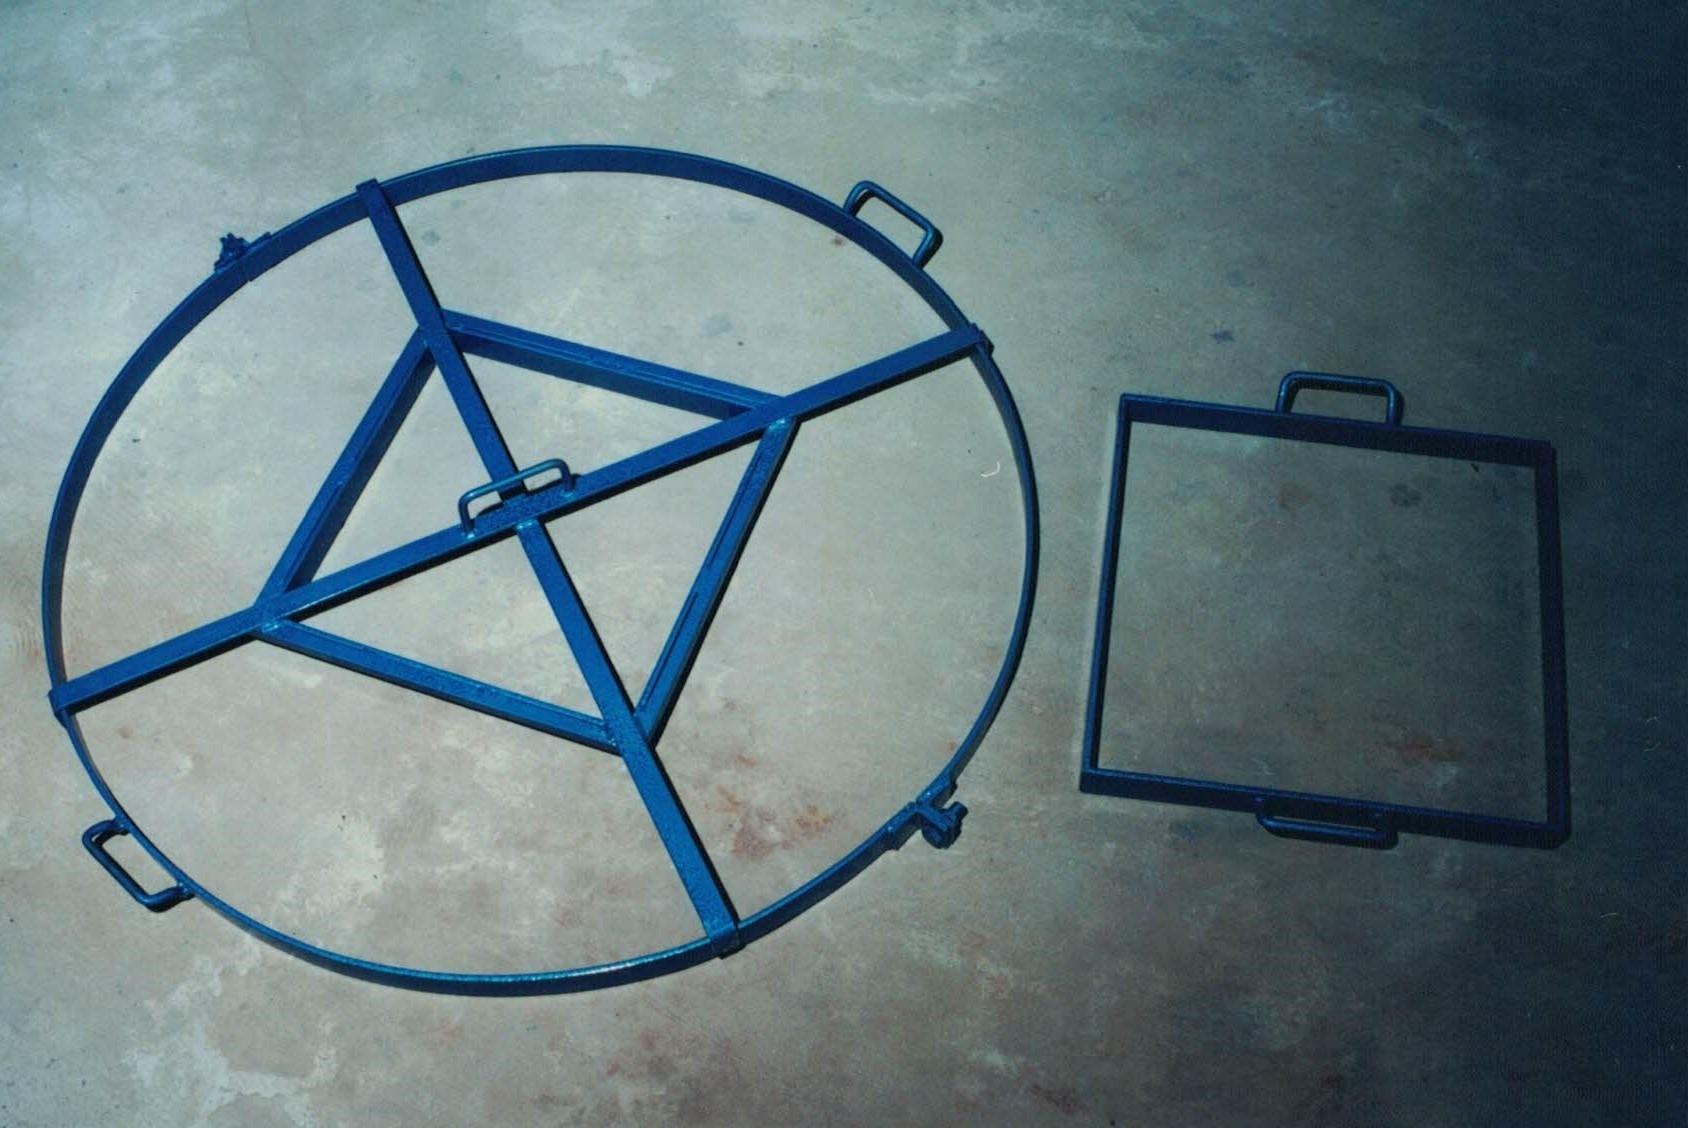 Kit para tampa e Aro de anel de poço - Foto 2